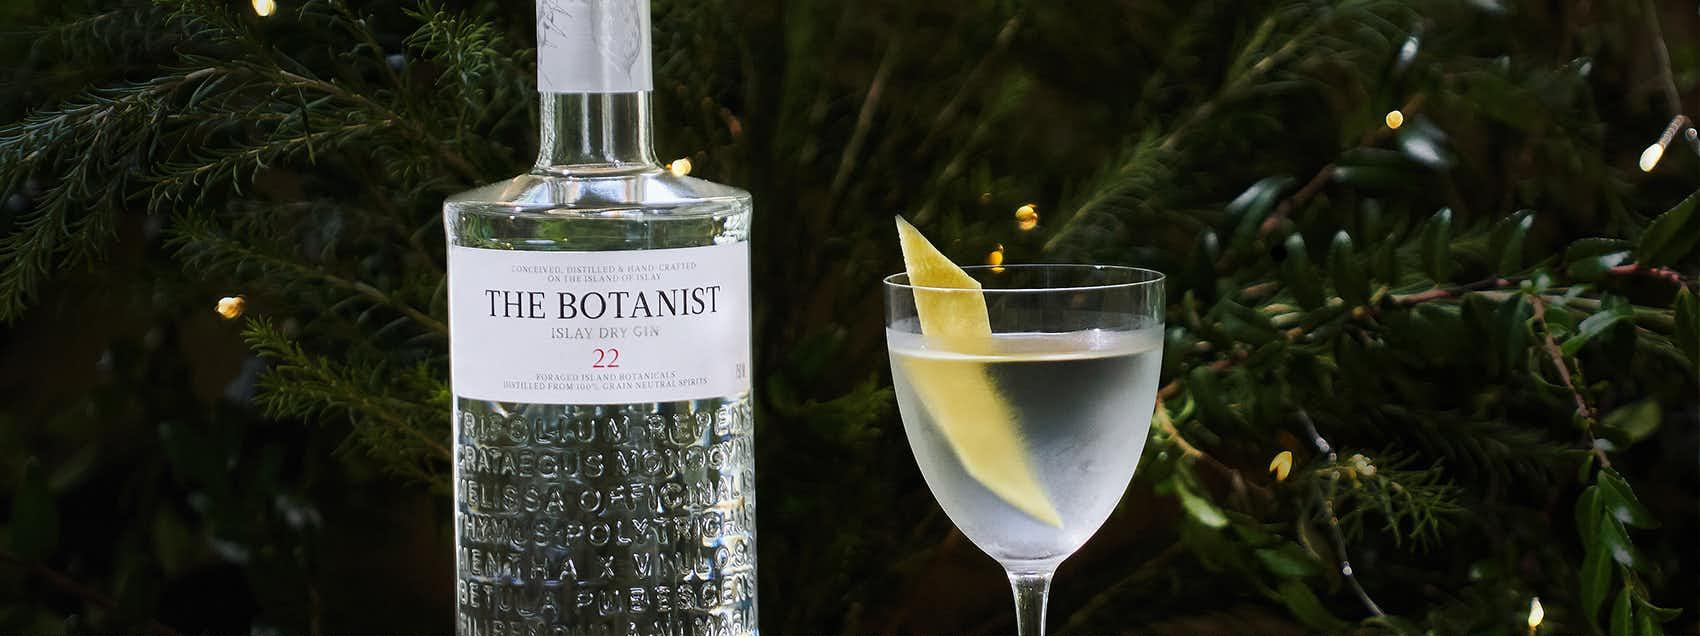 The Botanist Martini